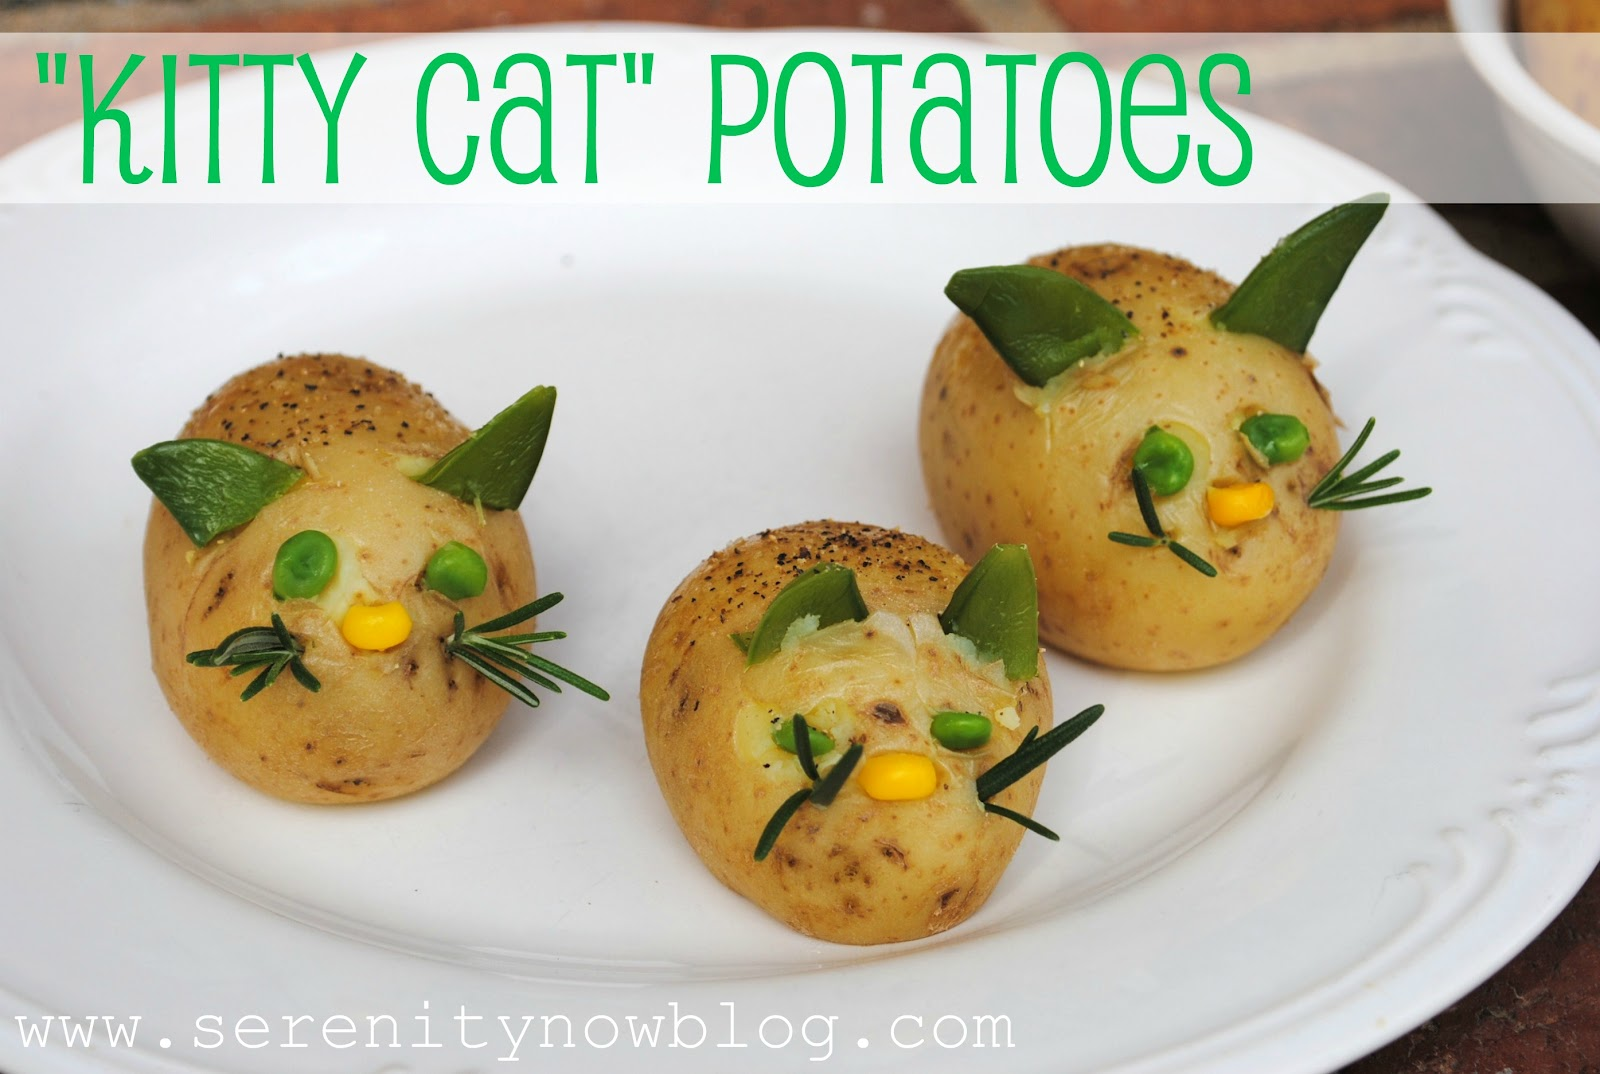 Serenity now veggie pets kitty cat potatoes